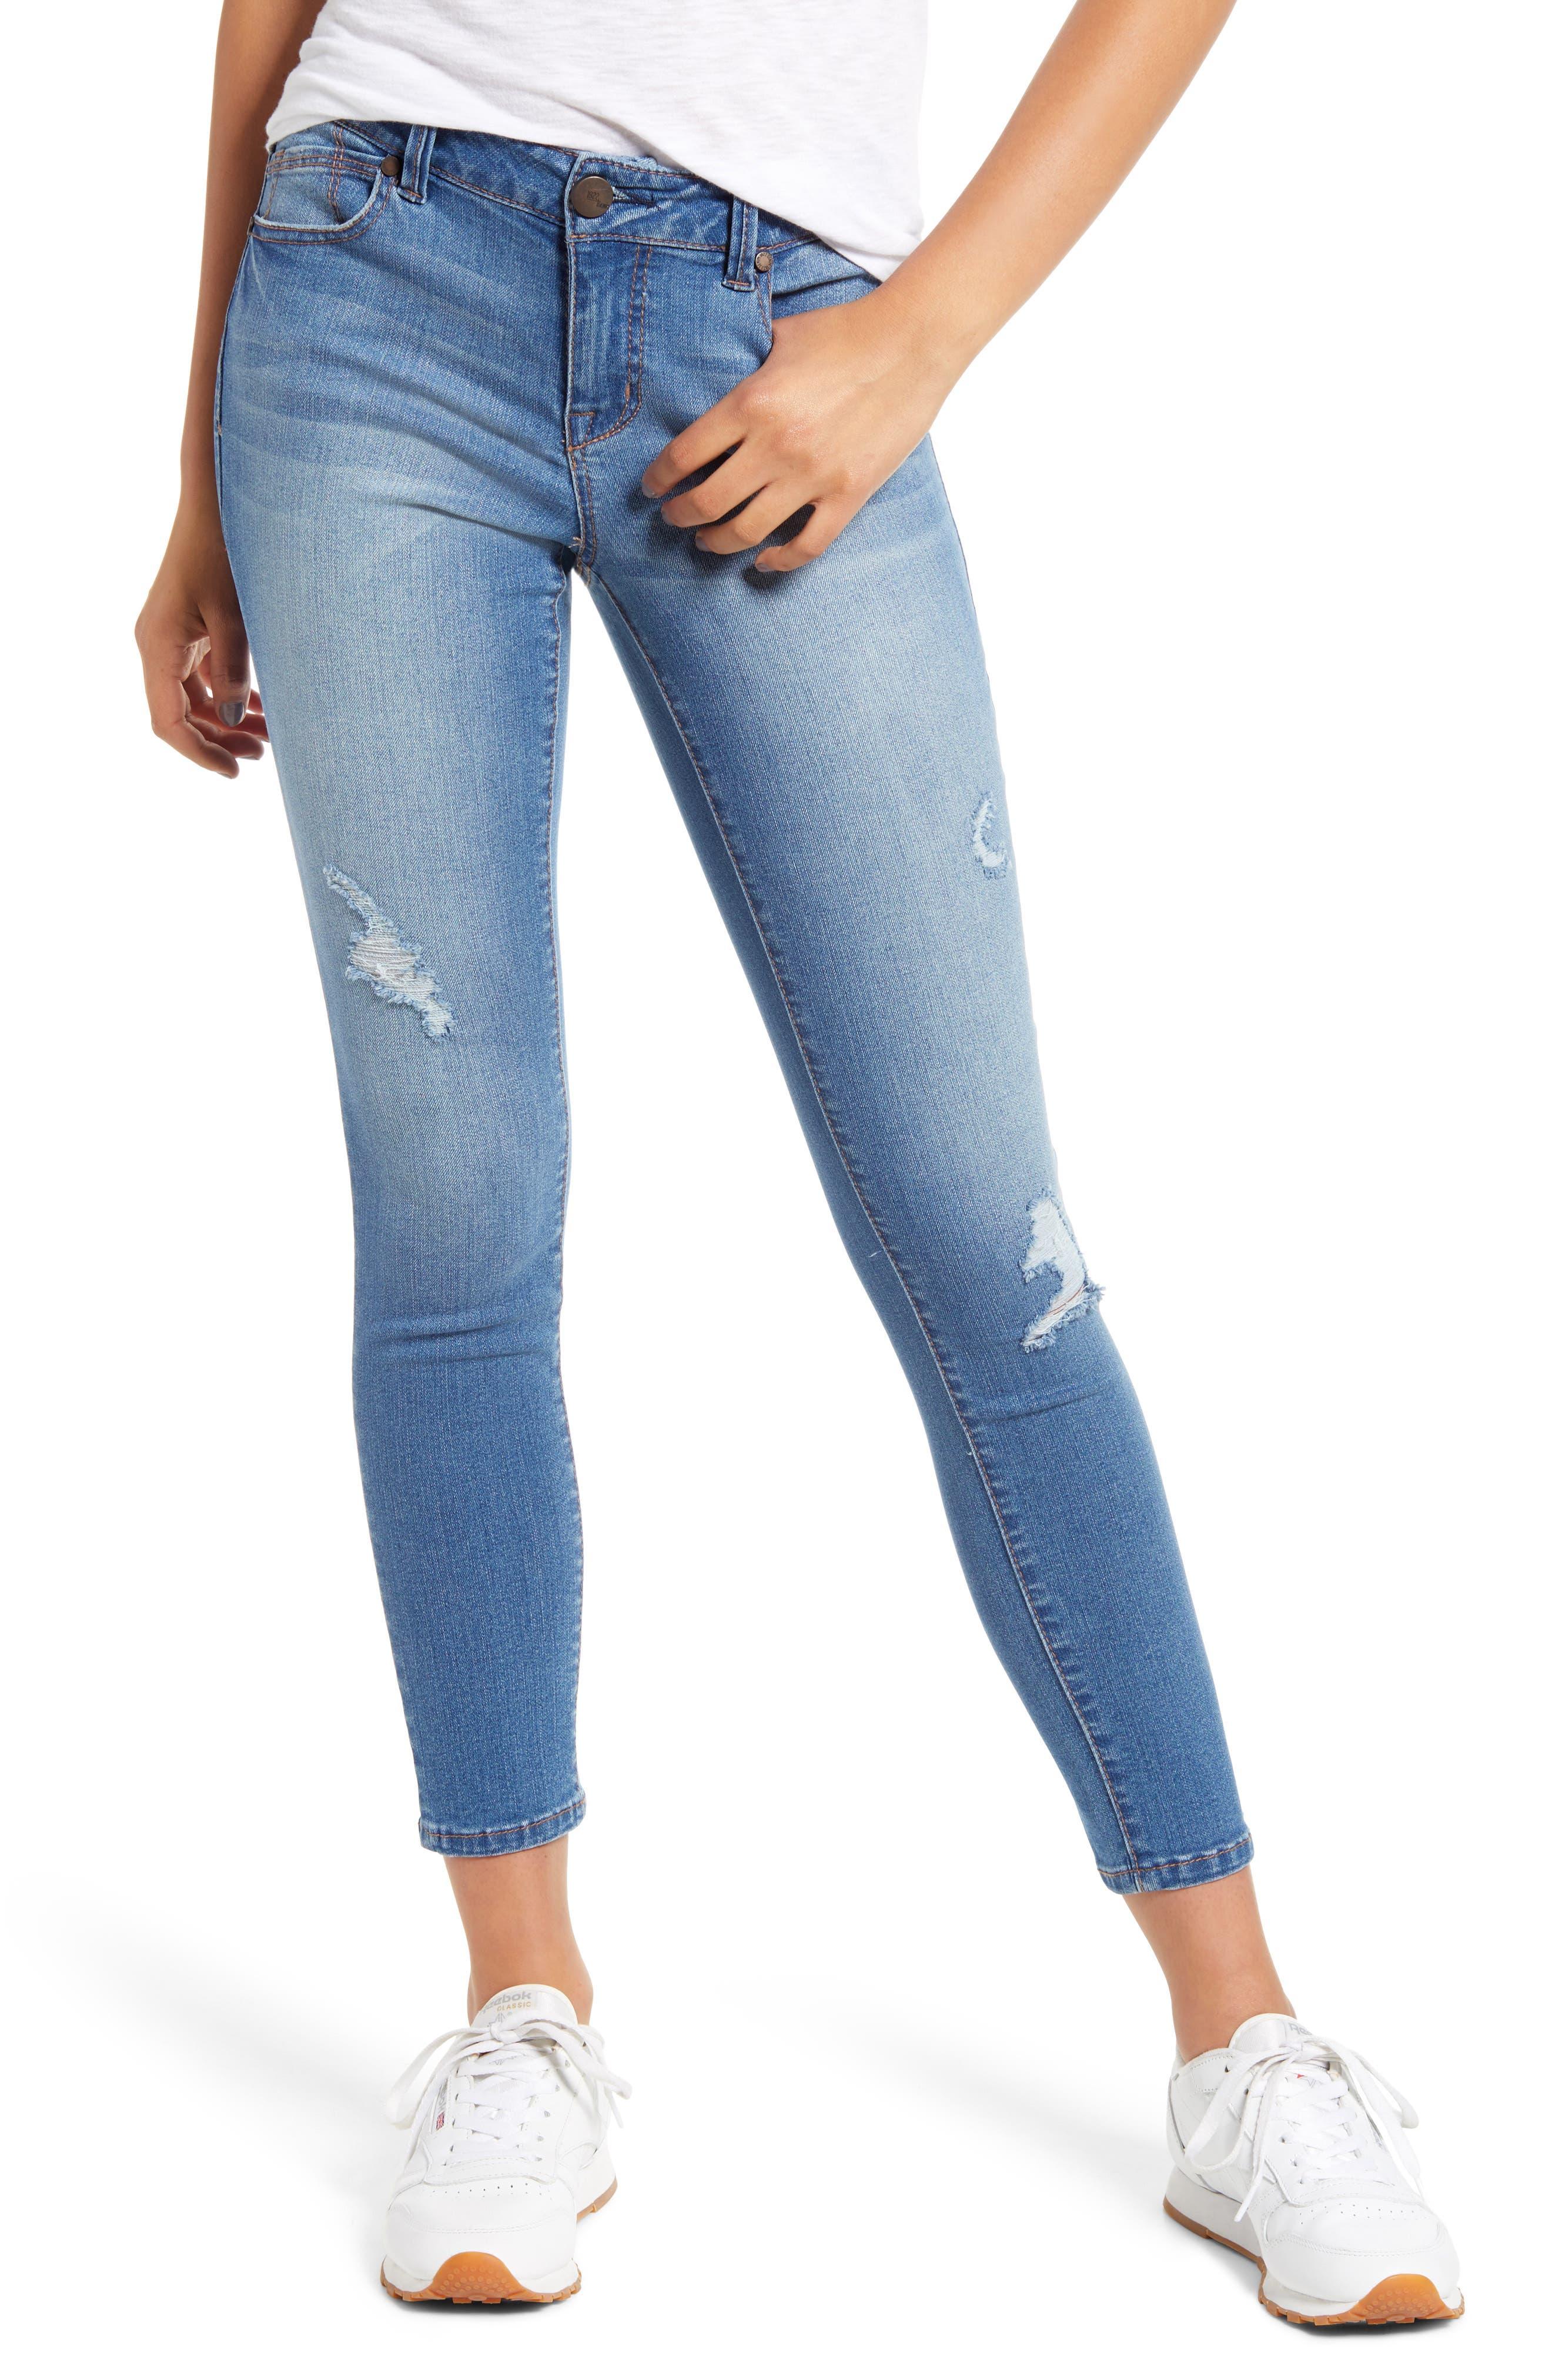 Women's 1822 Denim Re: denim Distressed Ankle Skinny Jeans,  27 - Blue